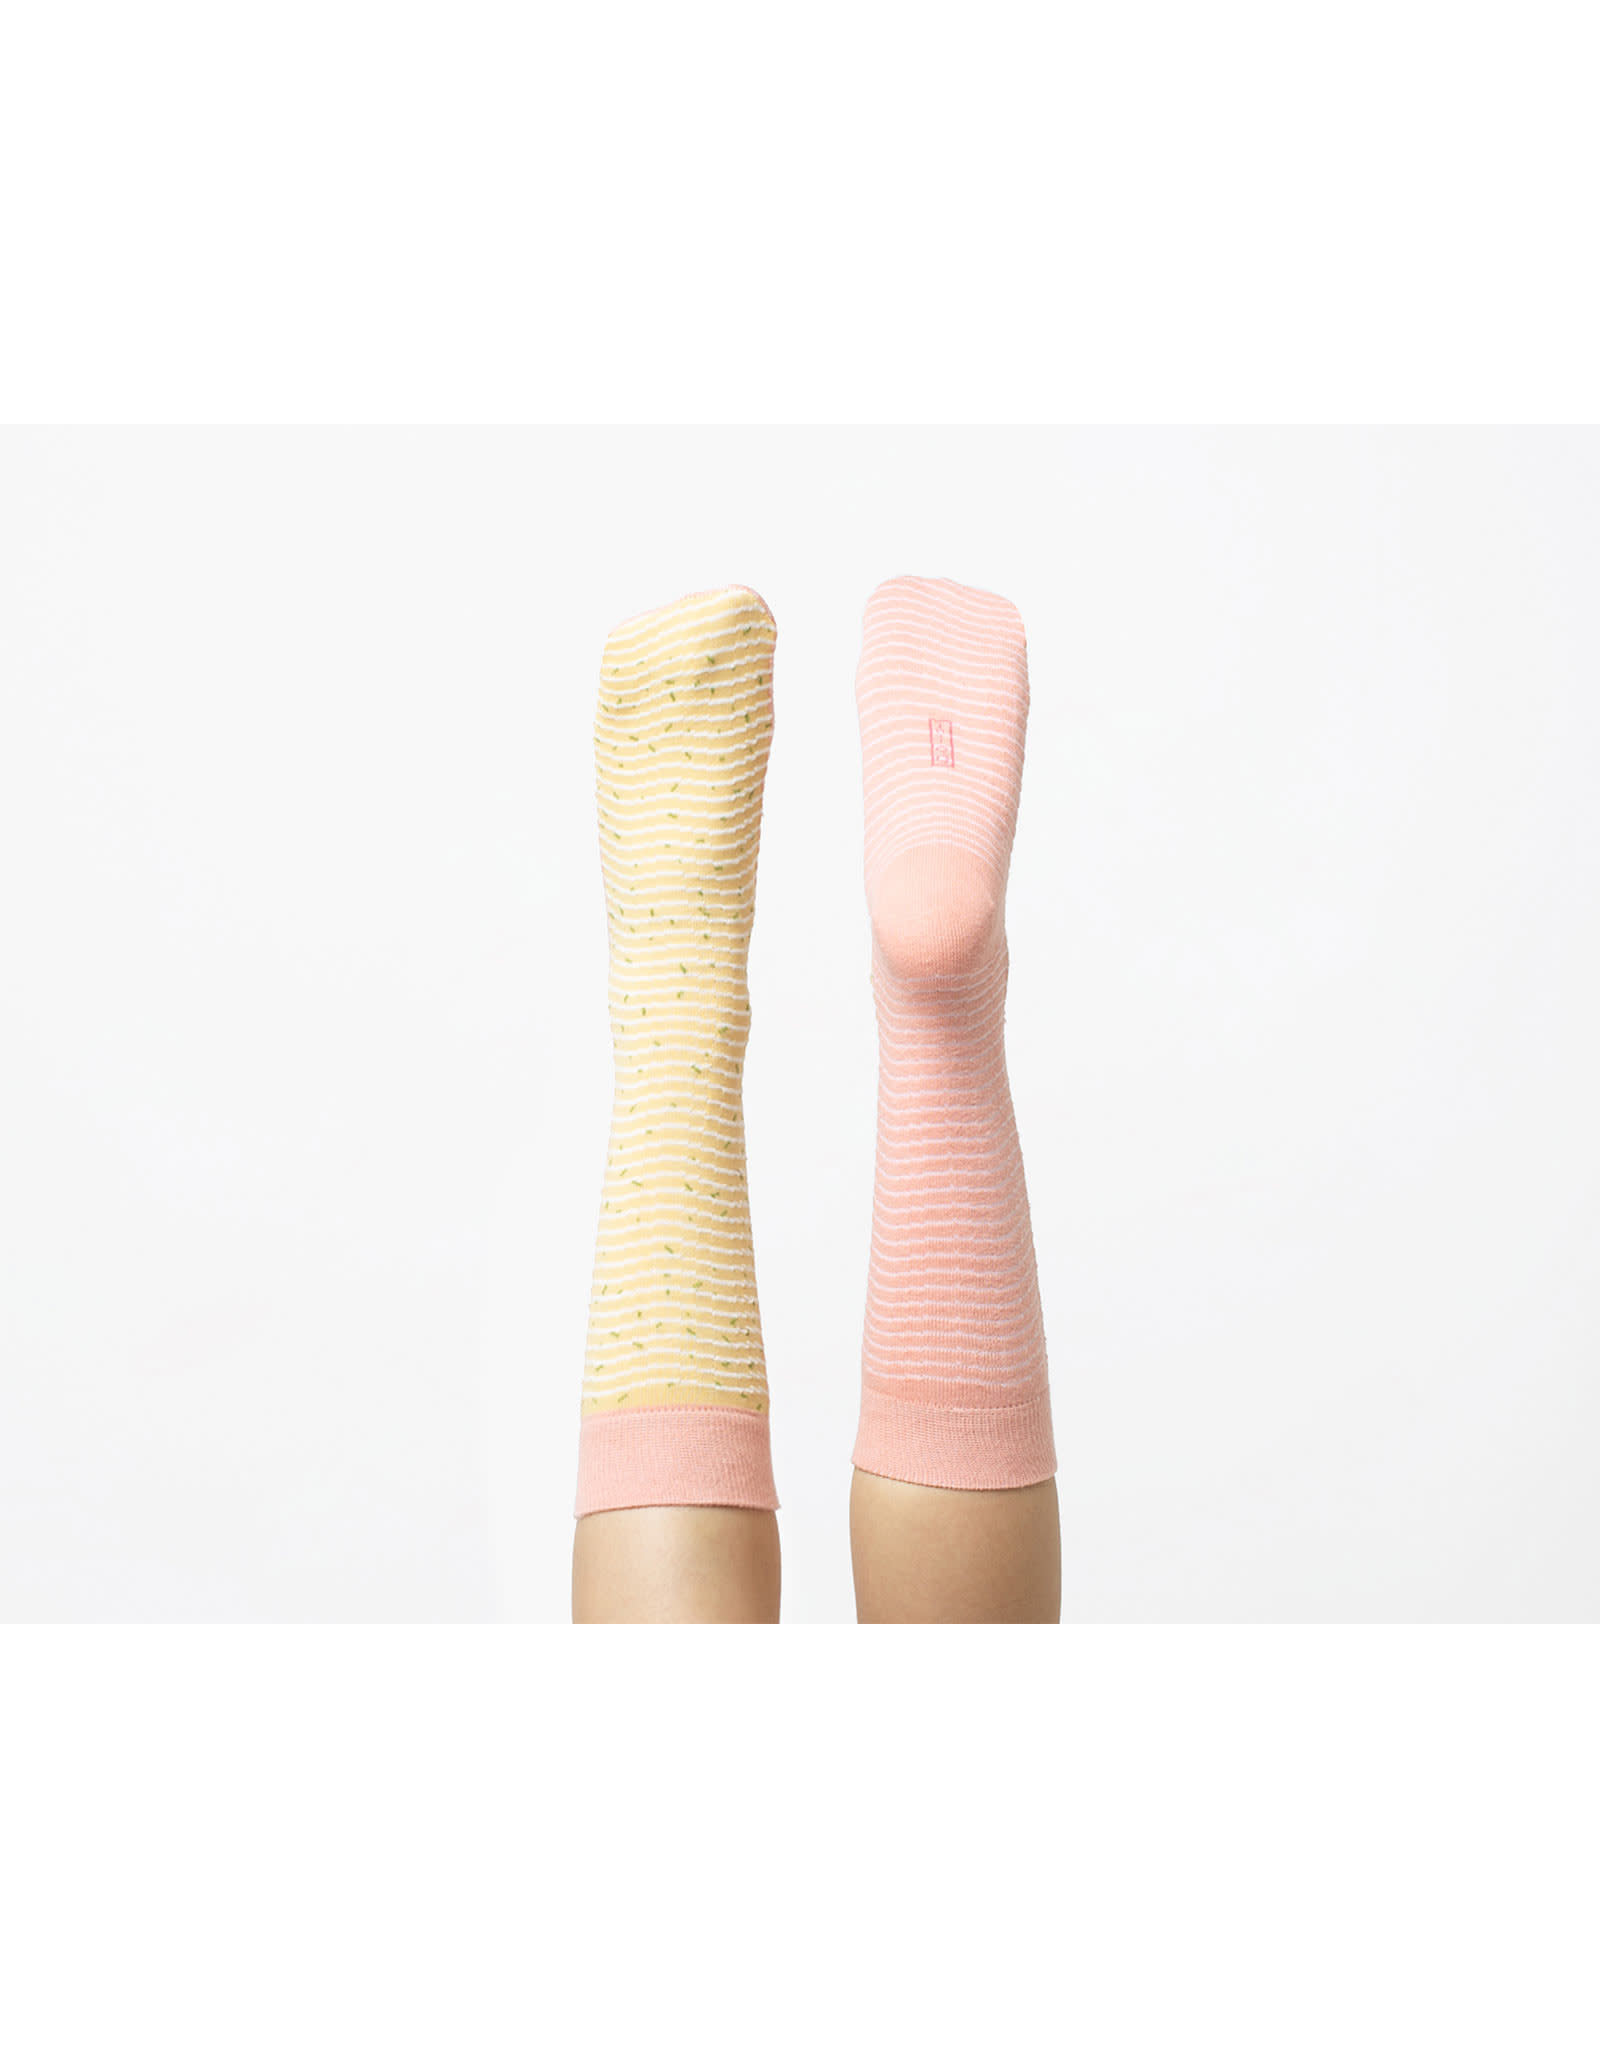 DOY - Ramen Socks / Set Of 2